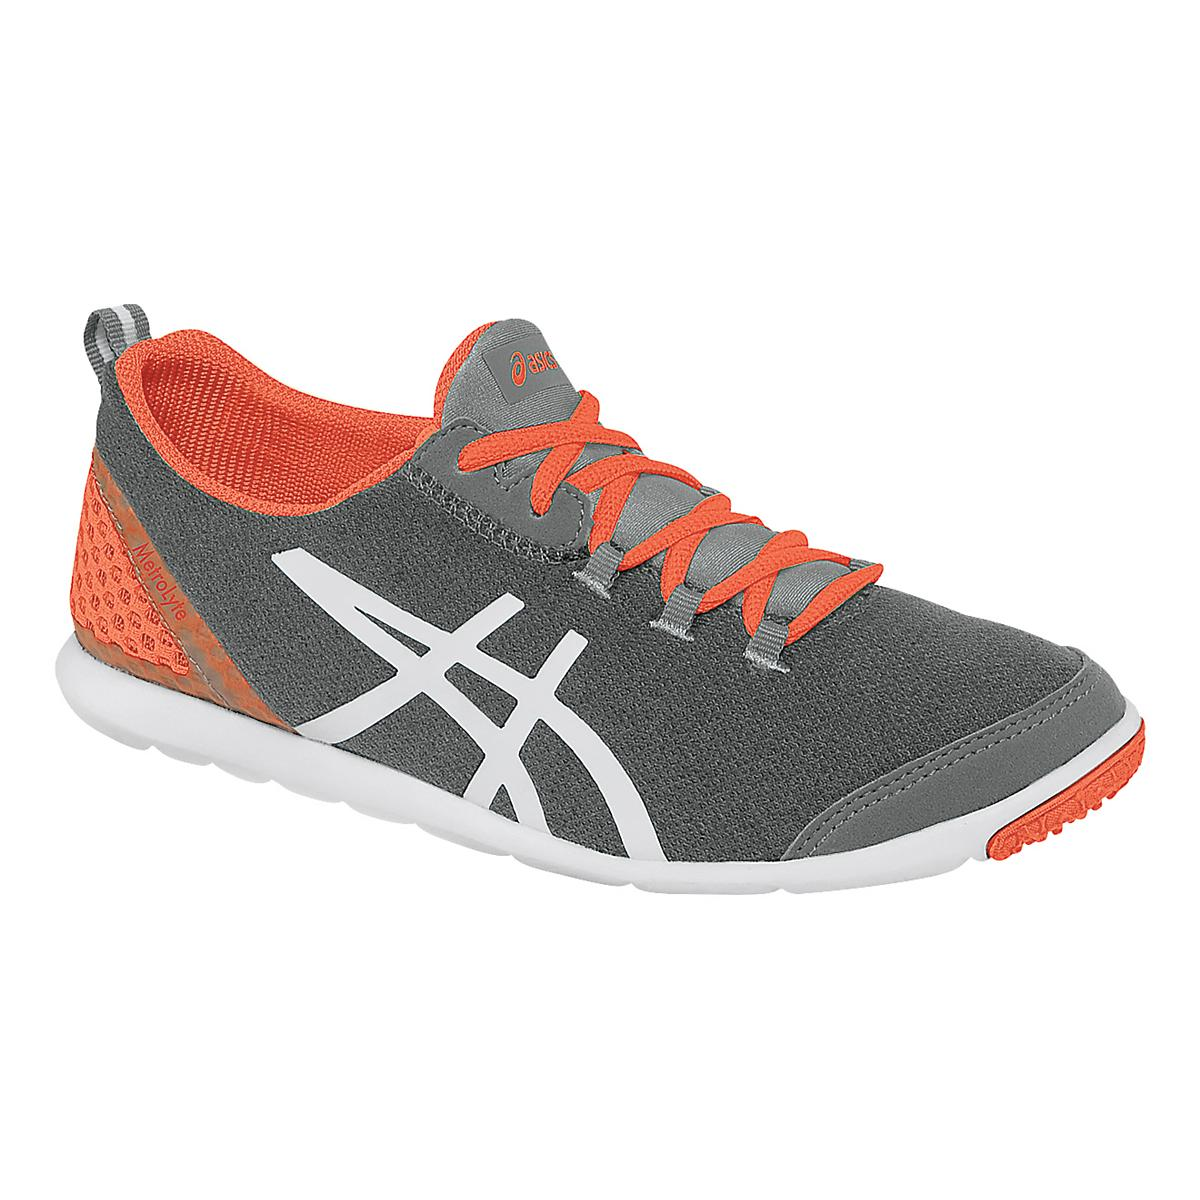 7a3de479ed170c Womens ASICS MetroLyte Walking Shoe at Road Runner Sports